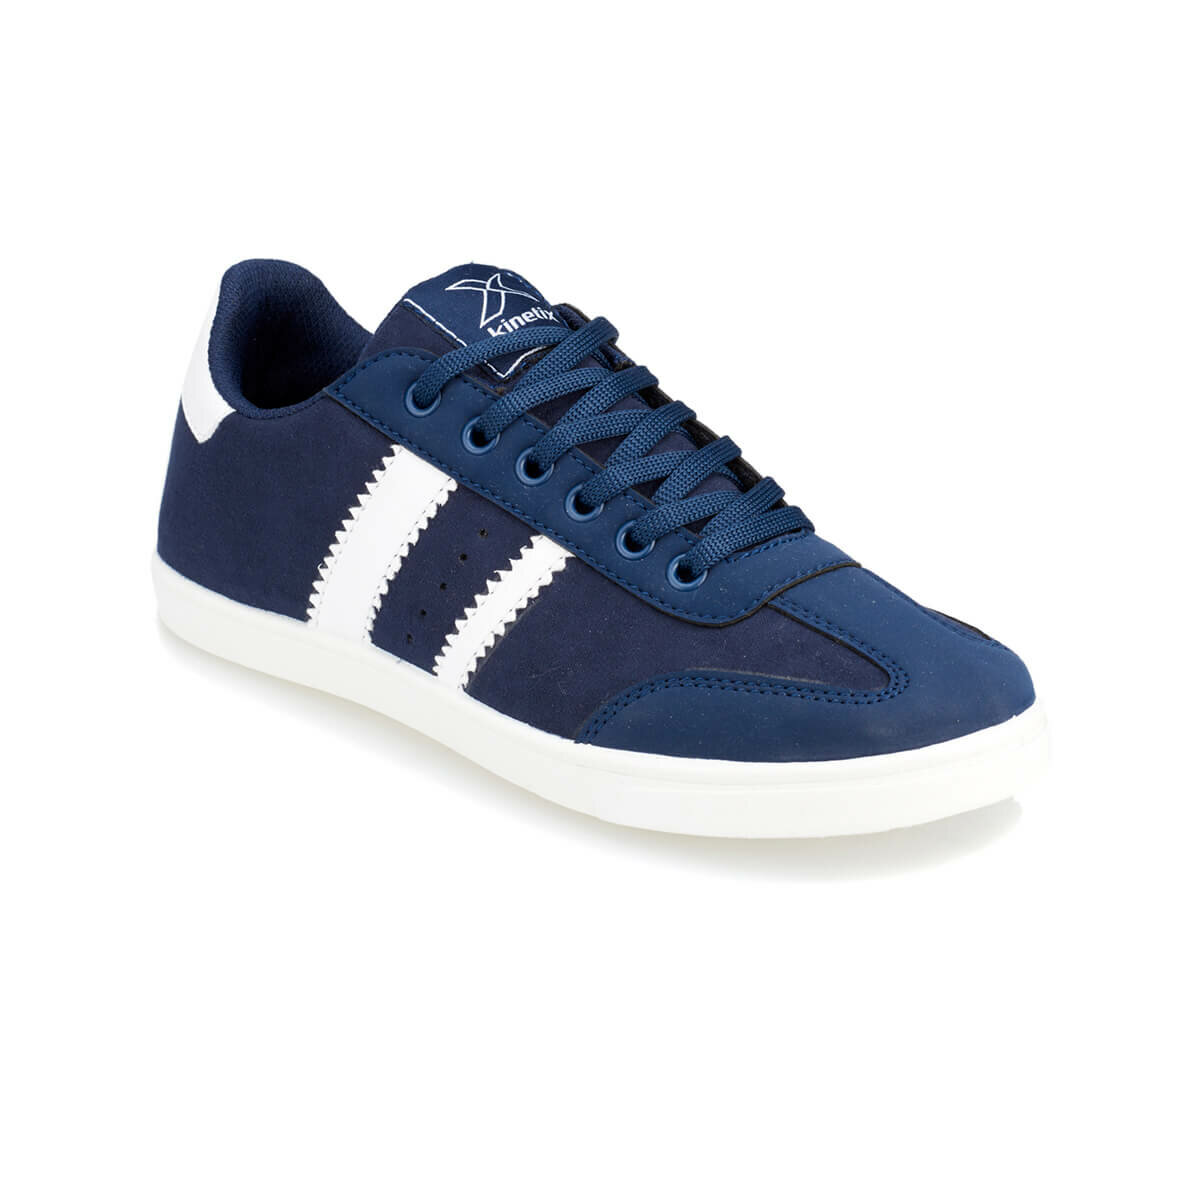 FLO ANJELIC Navy Blue Women 'S Sneaker Shoes KINETIX